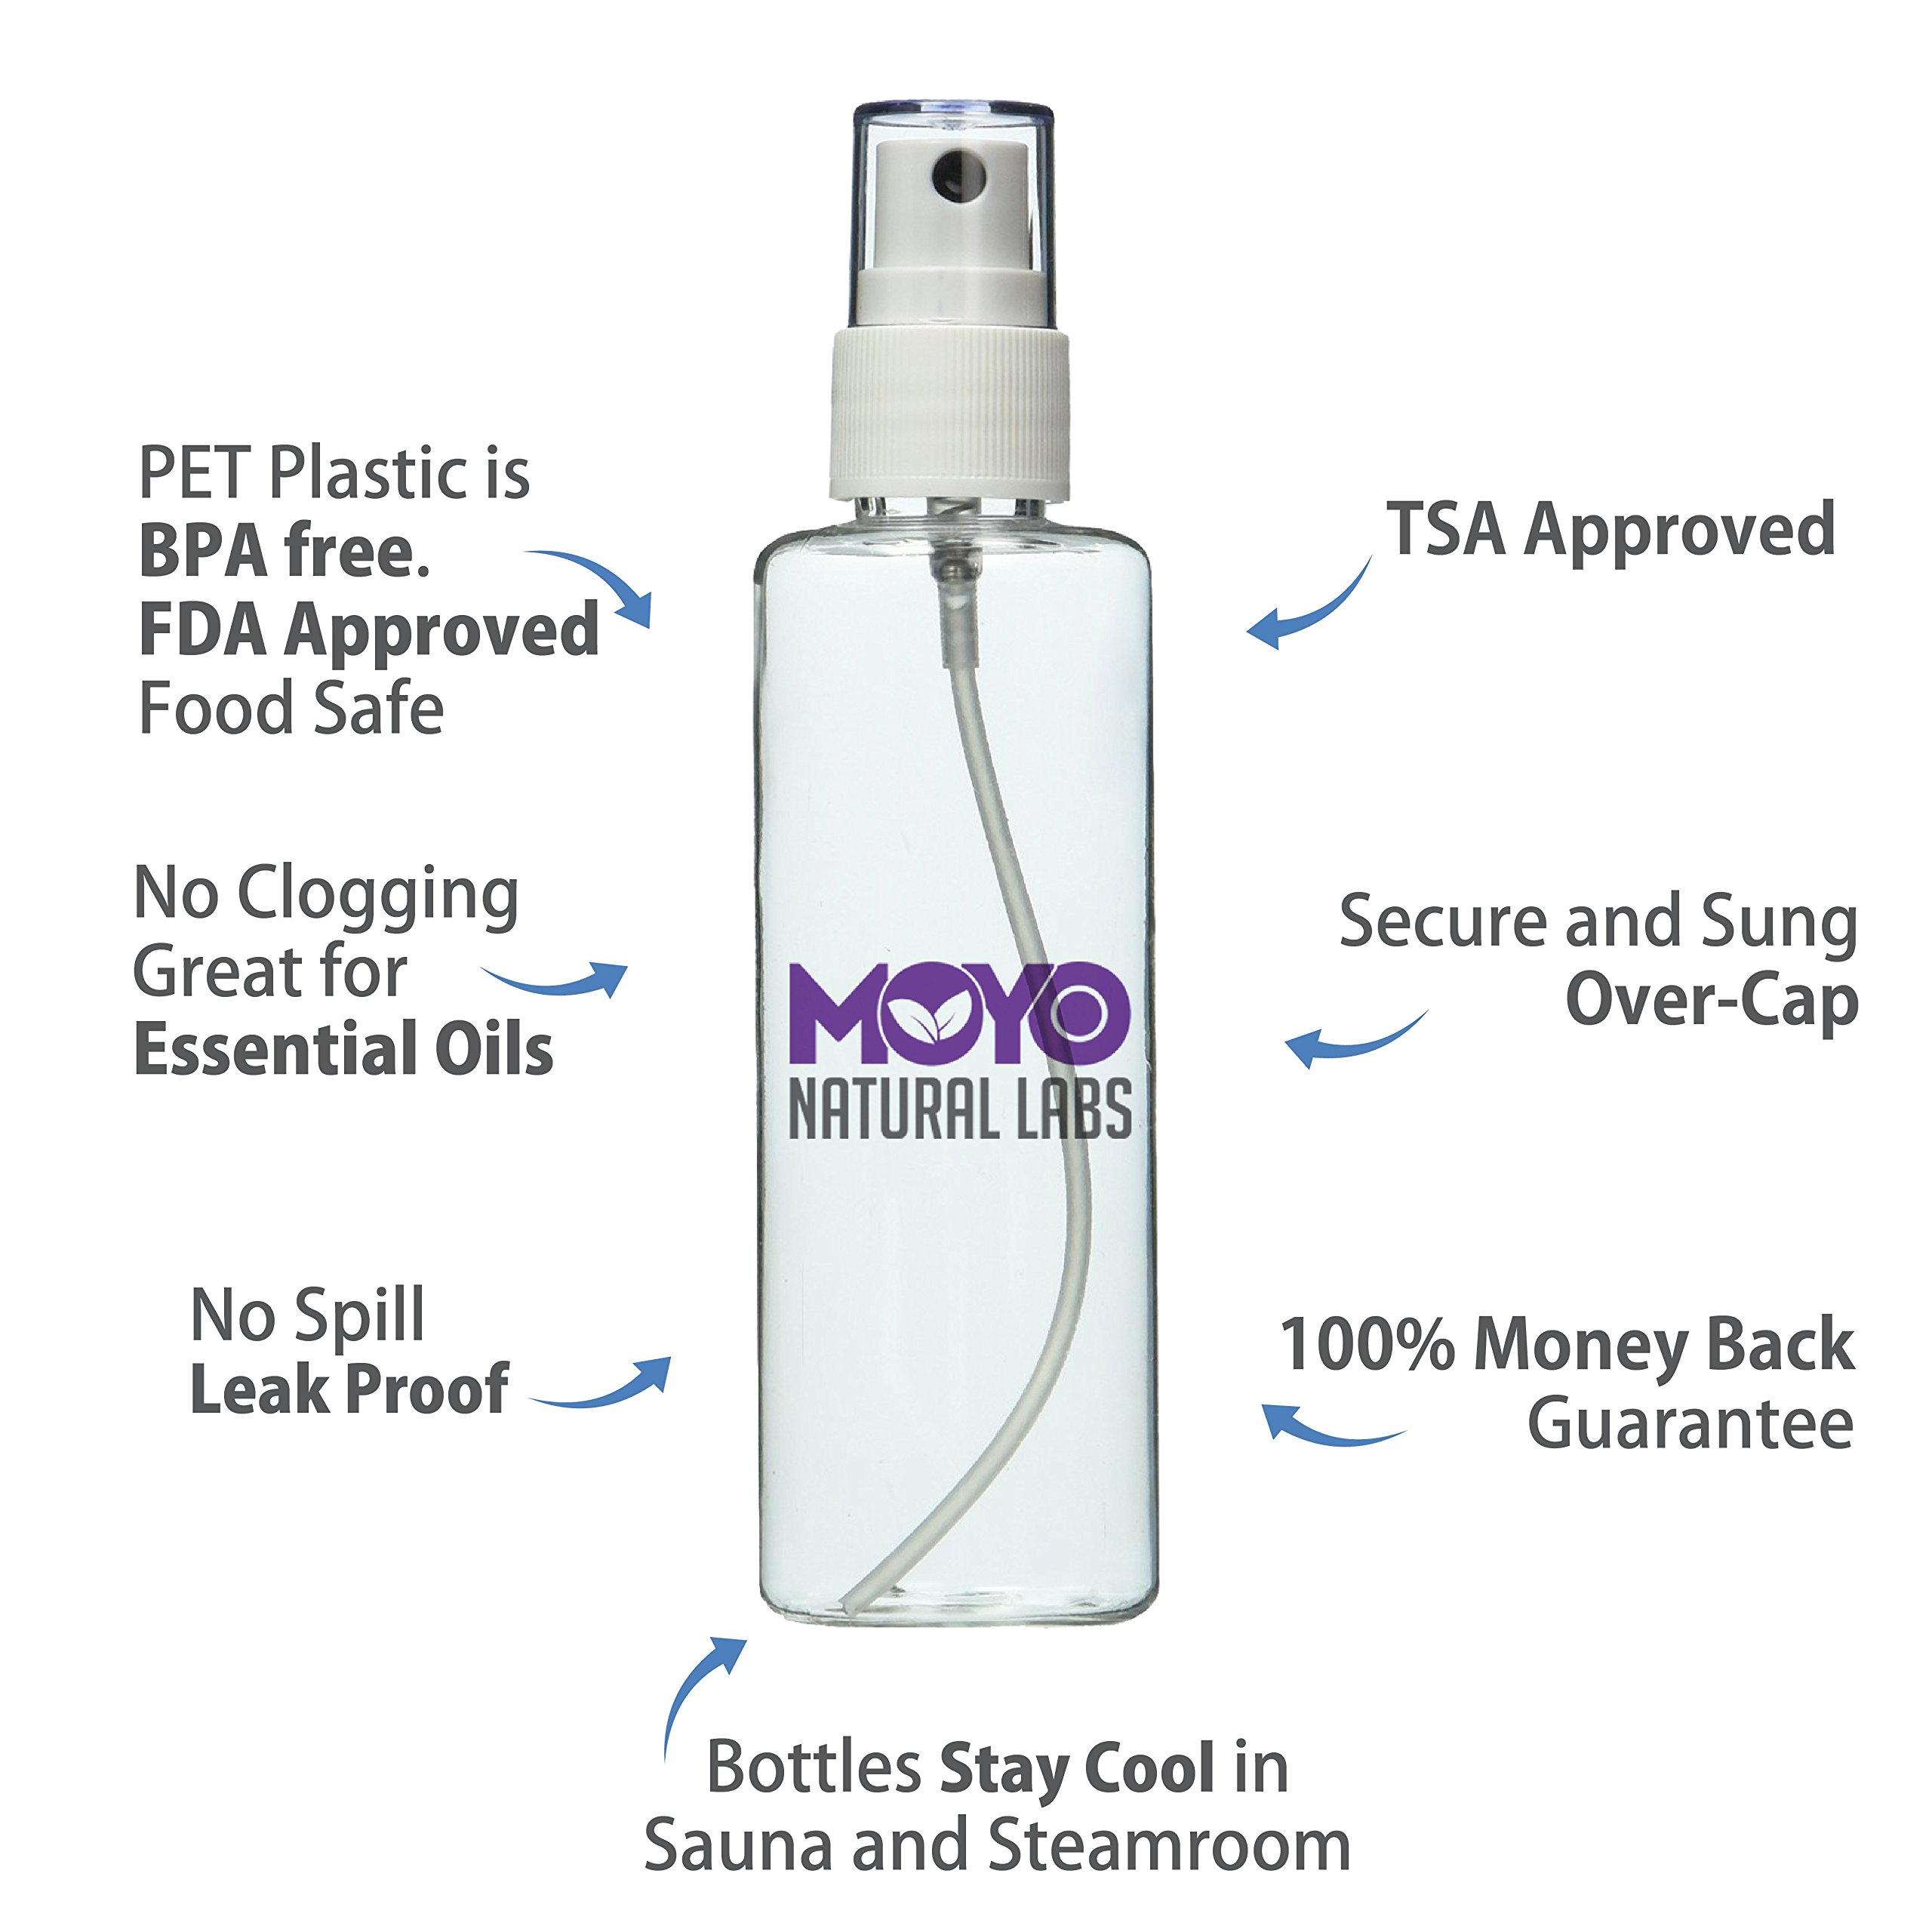 MoYo Natural Labs Large Durable Fine Mist Pump Sprayers 3.4 oz Travel Bottle Pump Sprayer Set quantity 3 BPA by MoYo Natural Labs (Image #3)